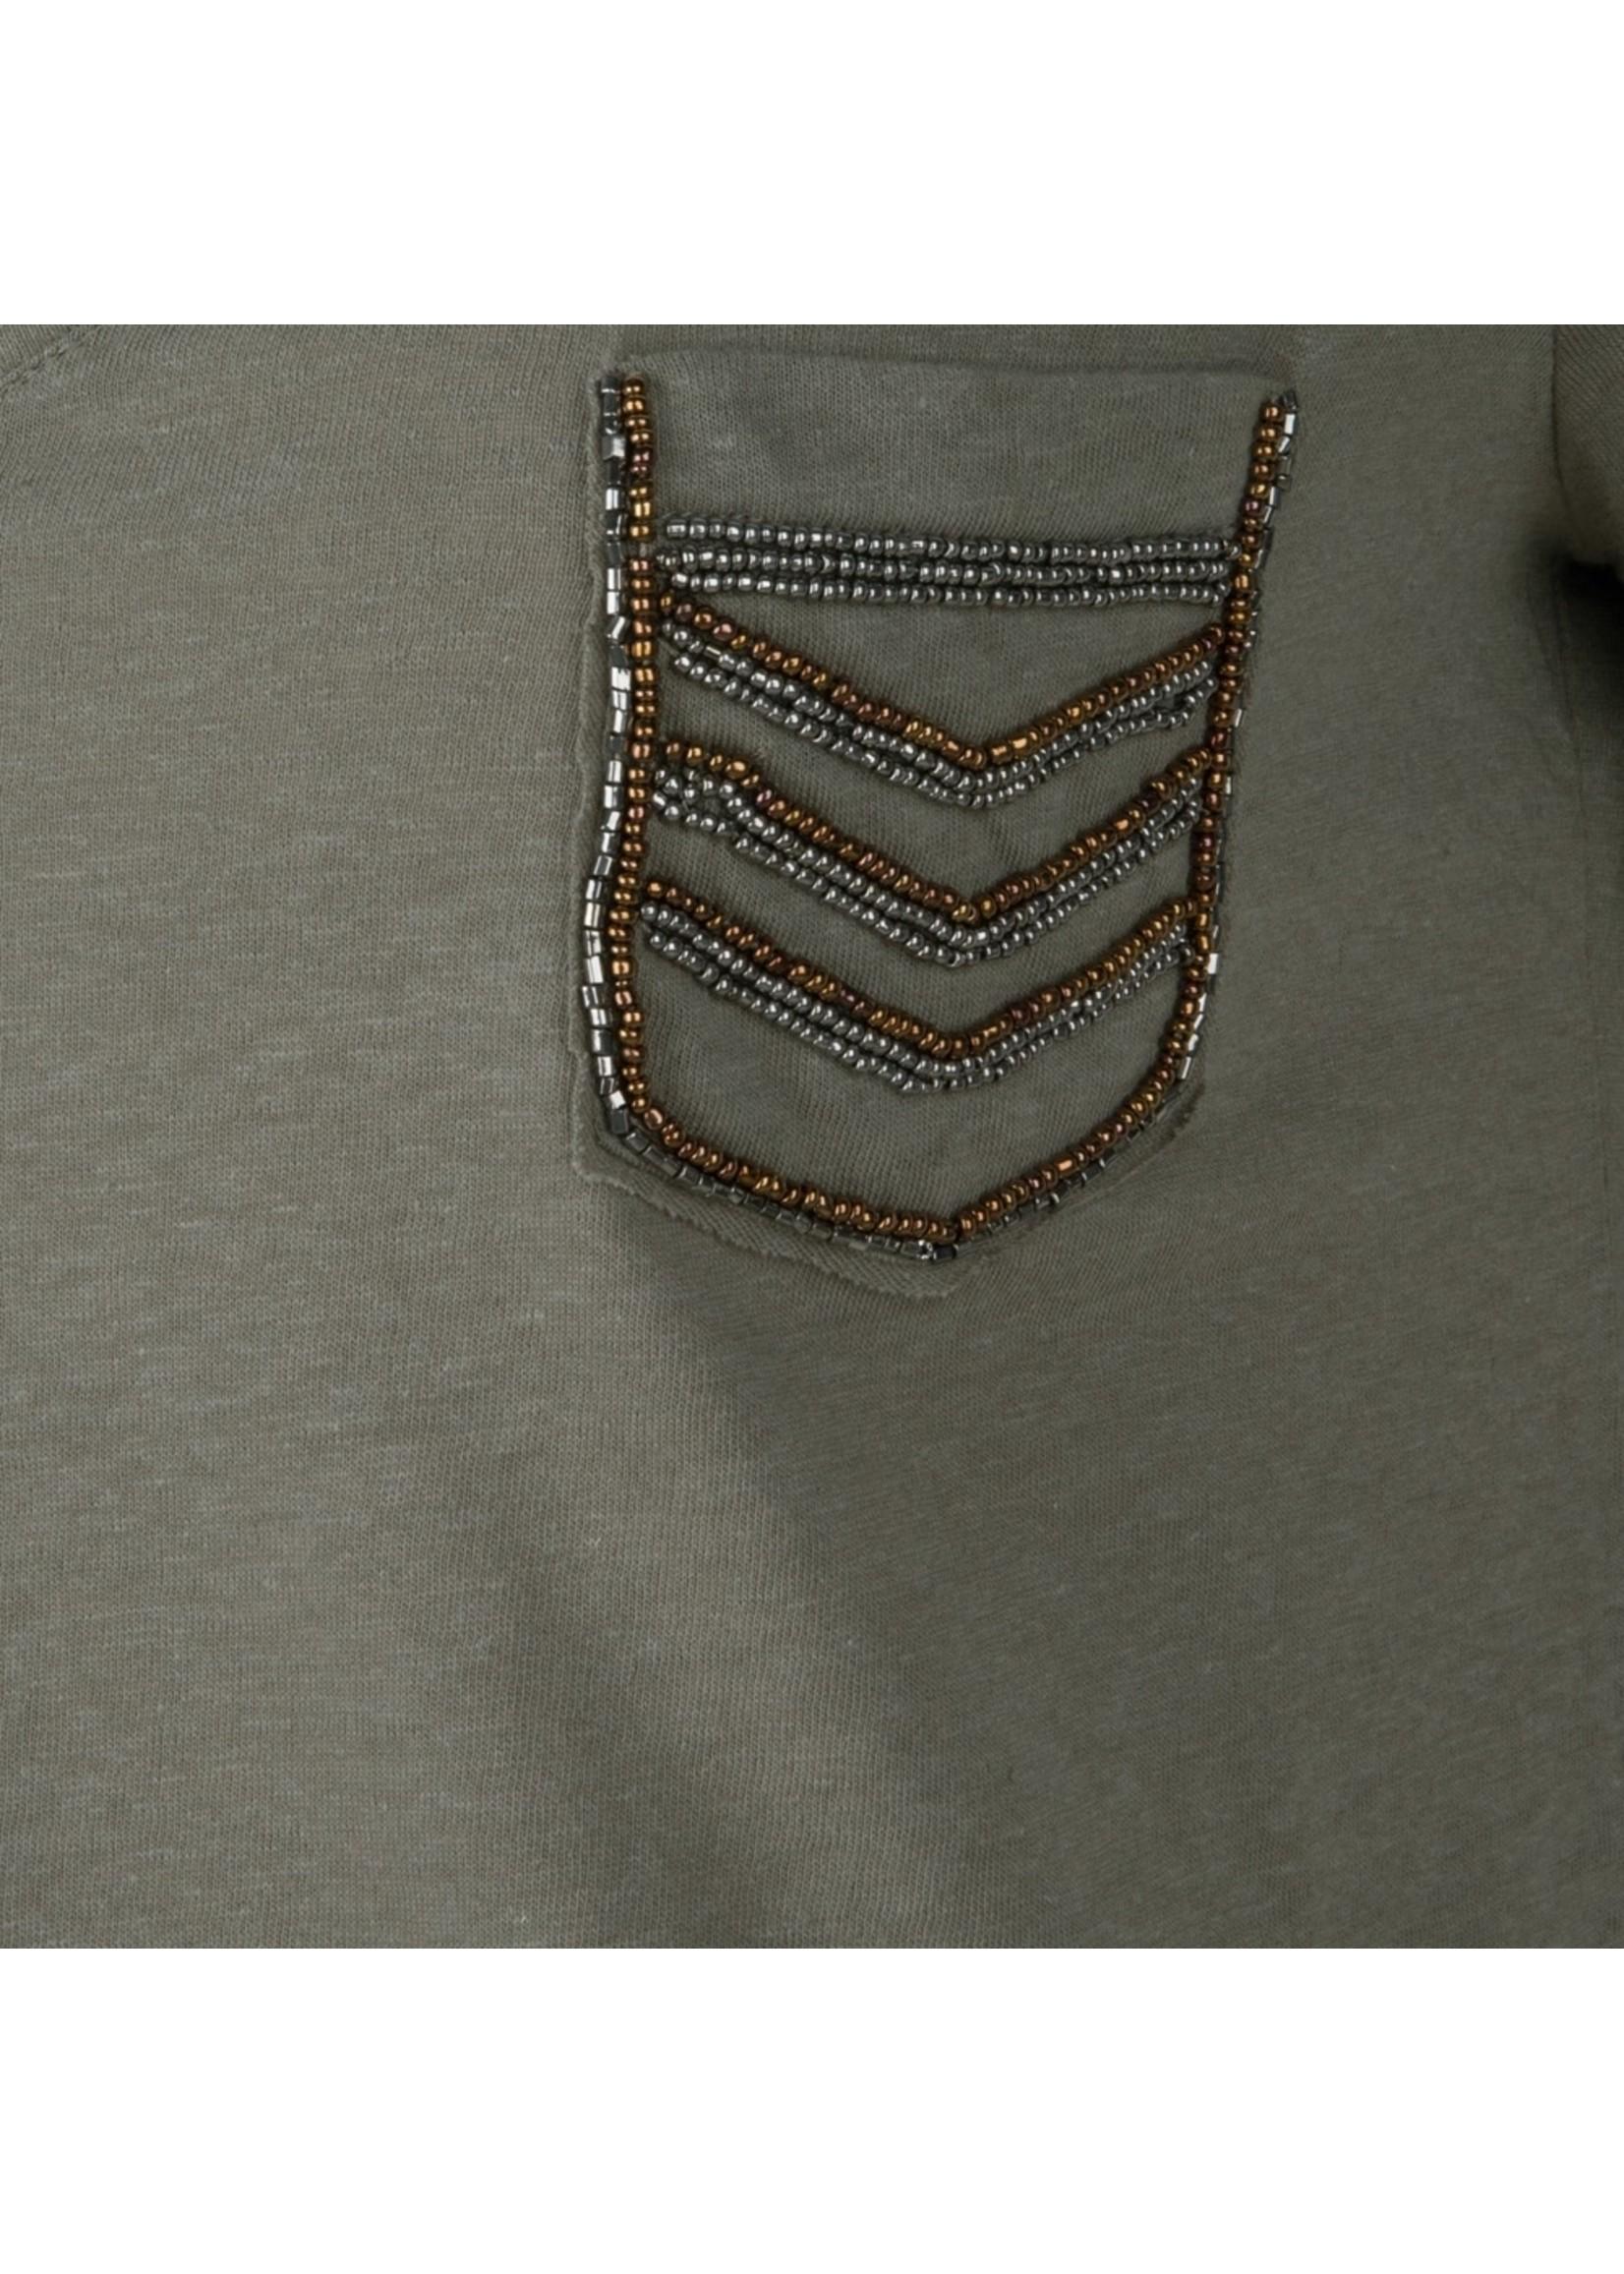 Esqualo T-shirt military patches